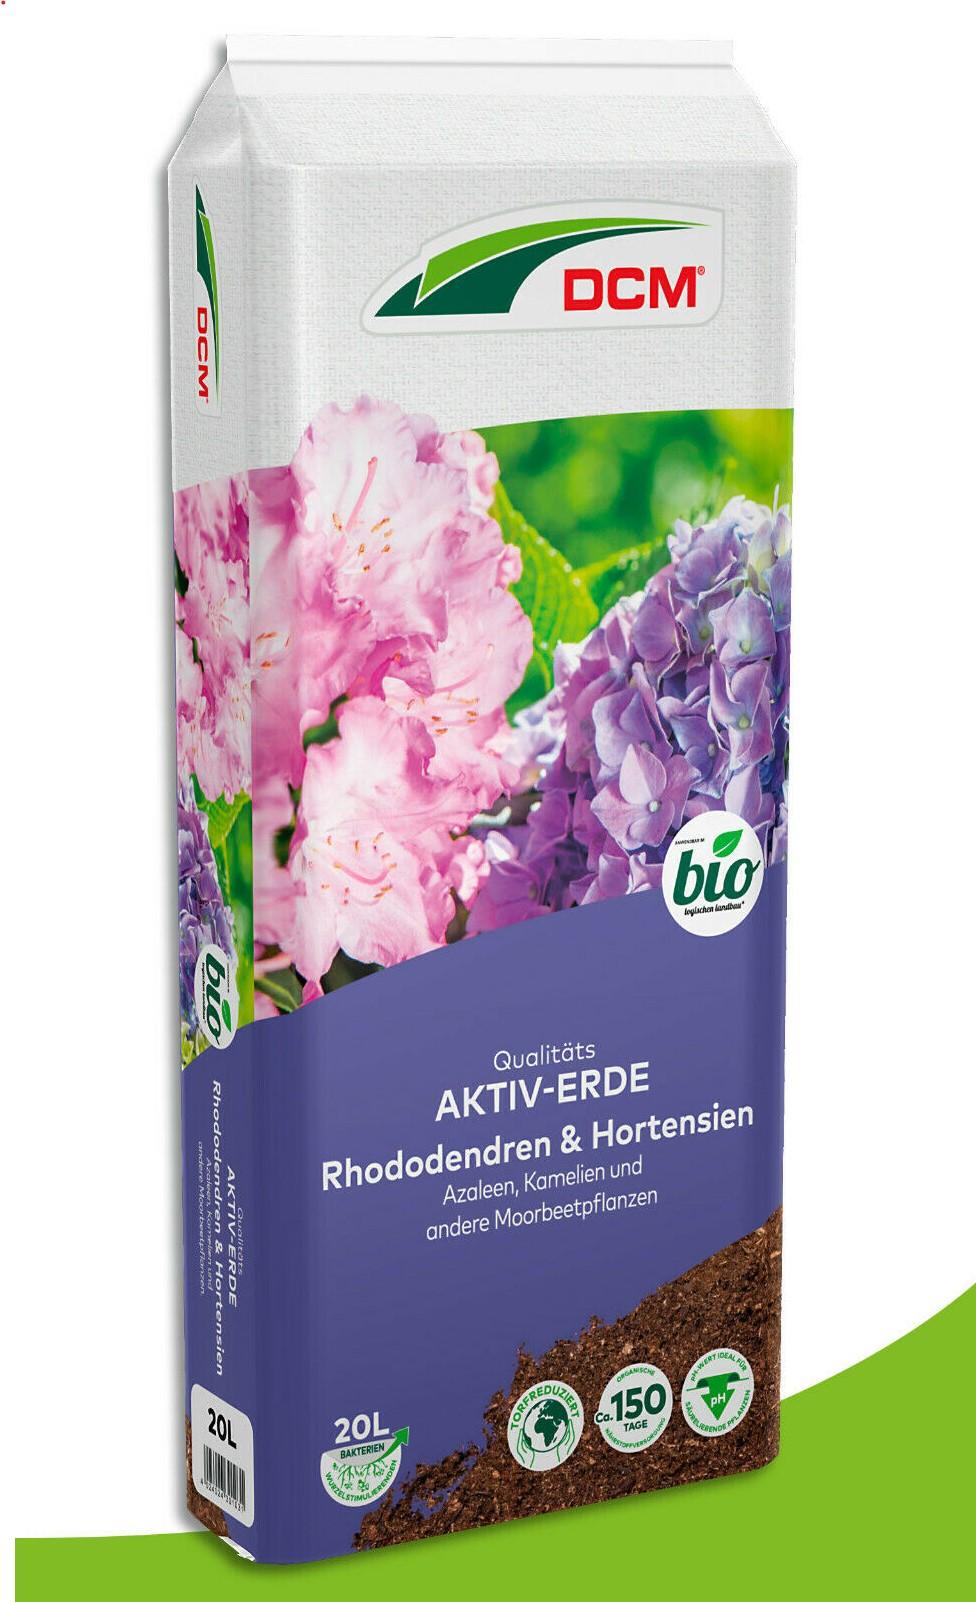 Cuxin Aktiv Erde Rhododendron & Hortensien-Erde  20  l Pflanzerde Blumenerde